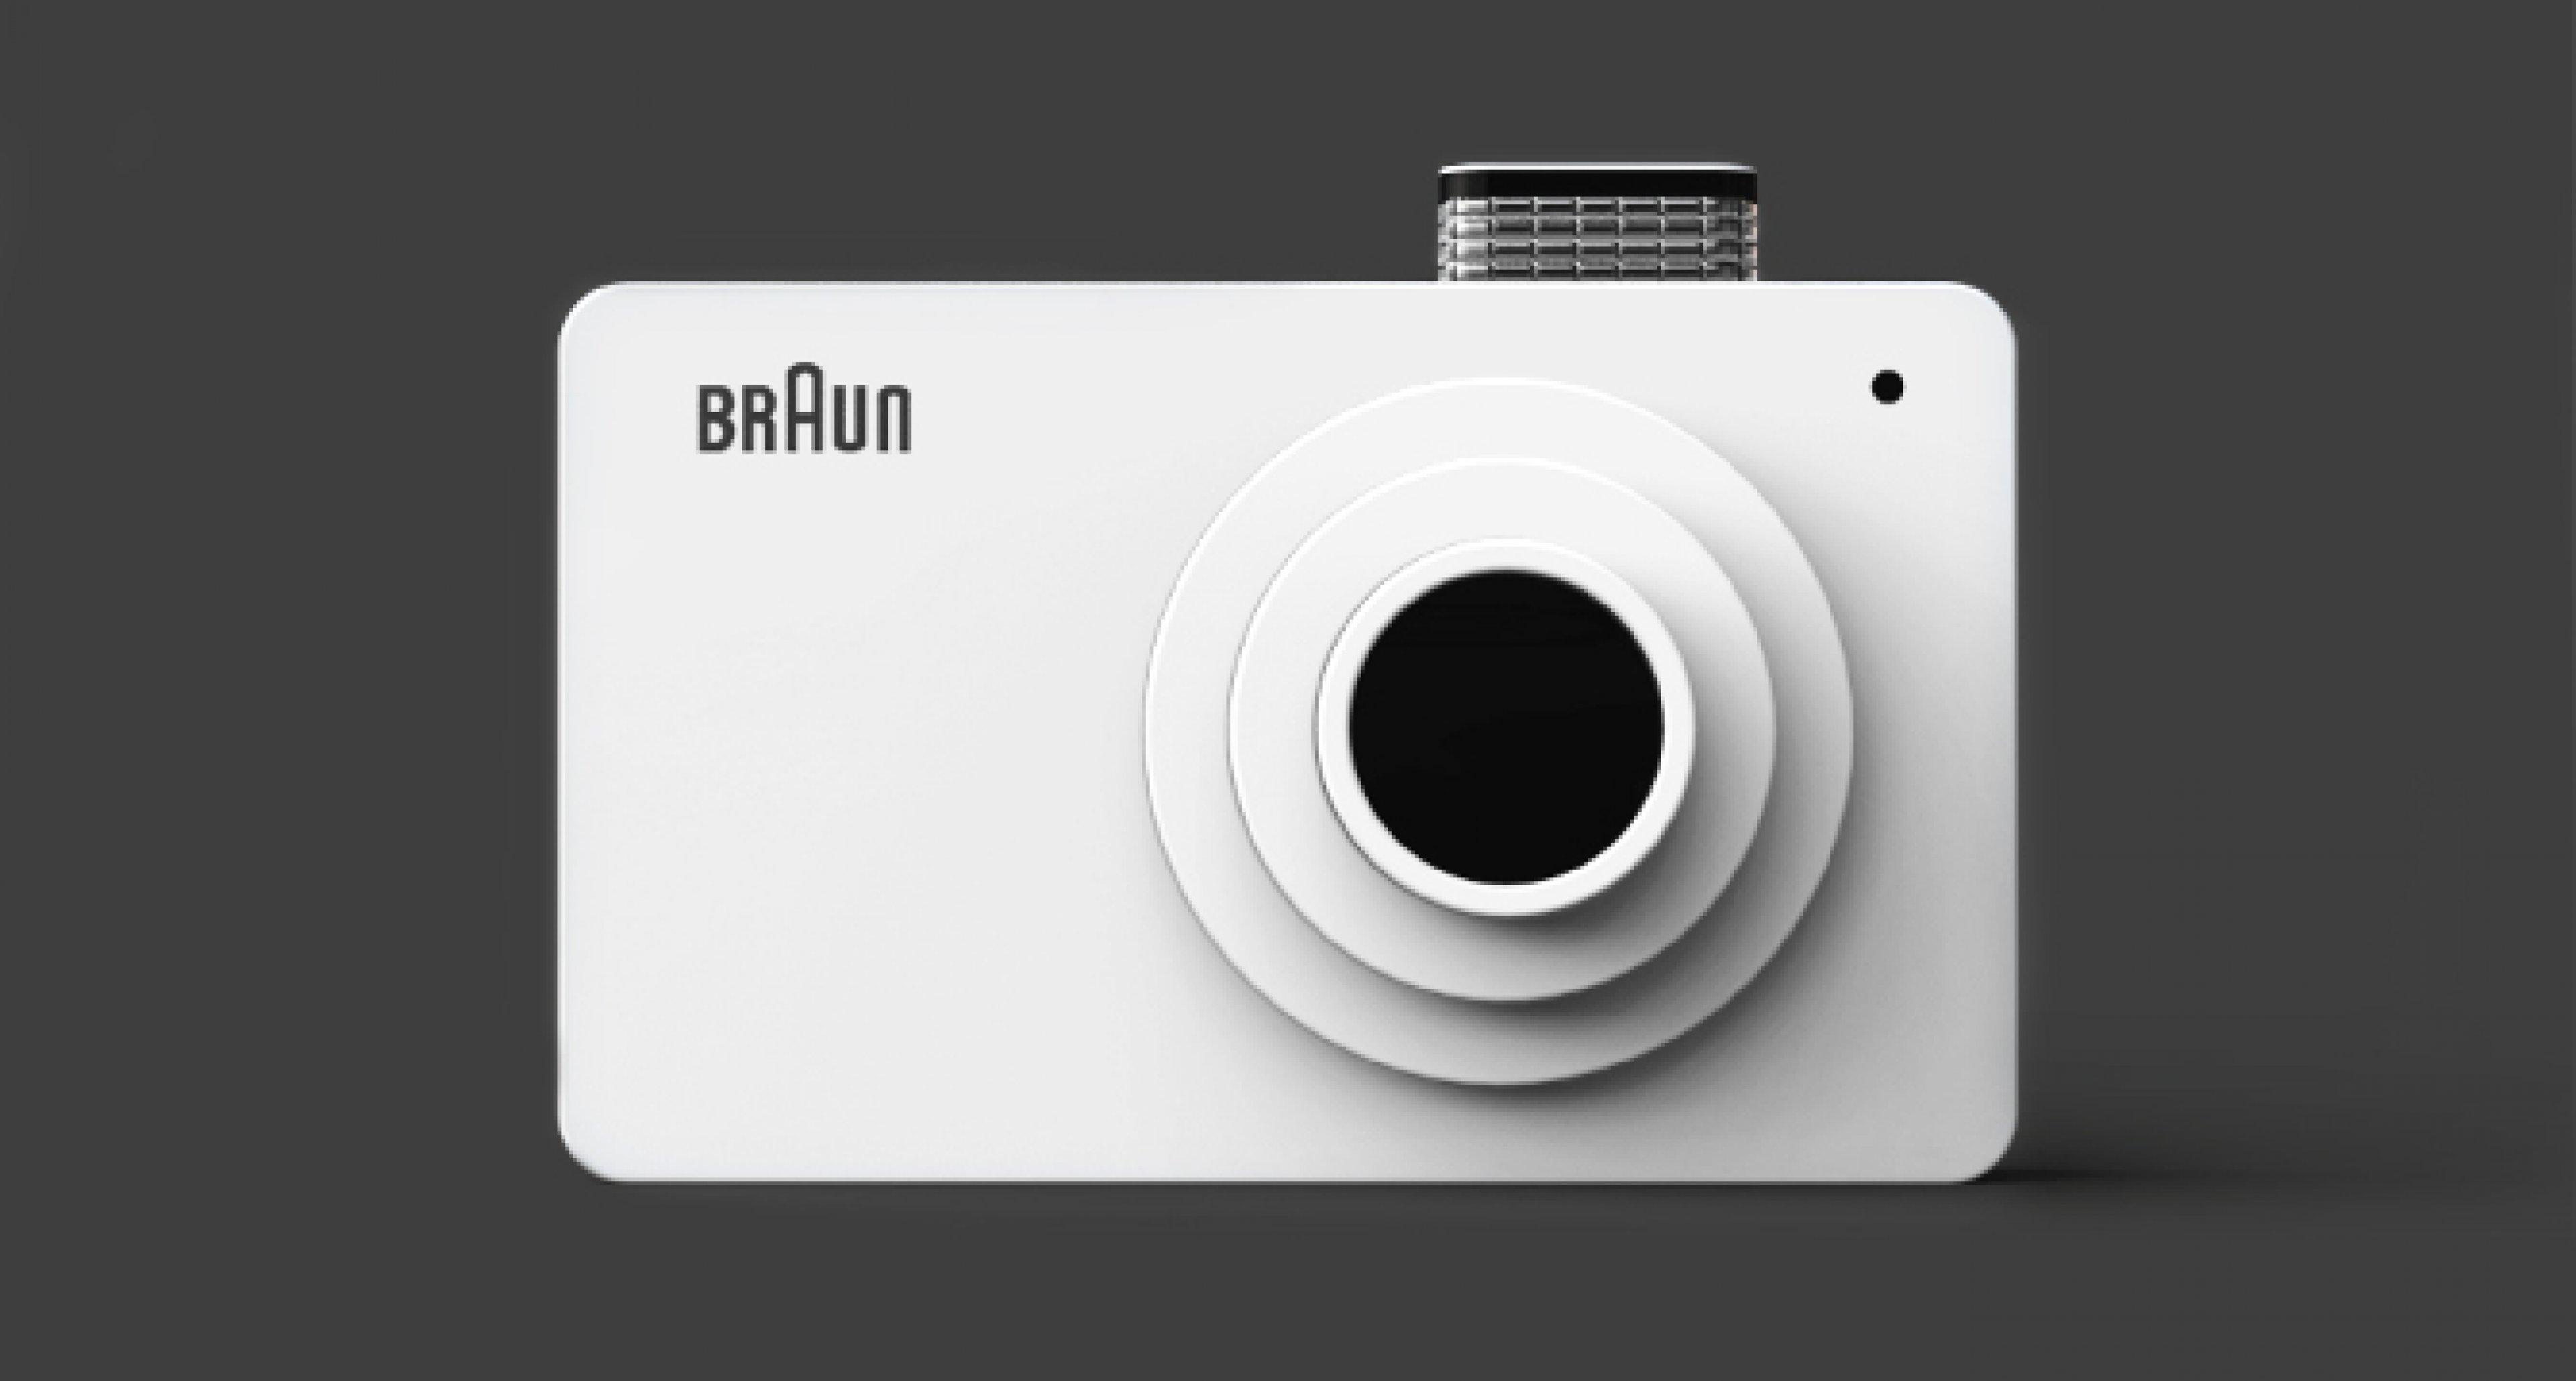 Konzept Kamera Aus Korea Verbeugung Vor Dieter Rams